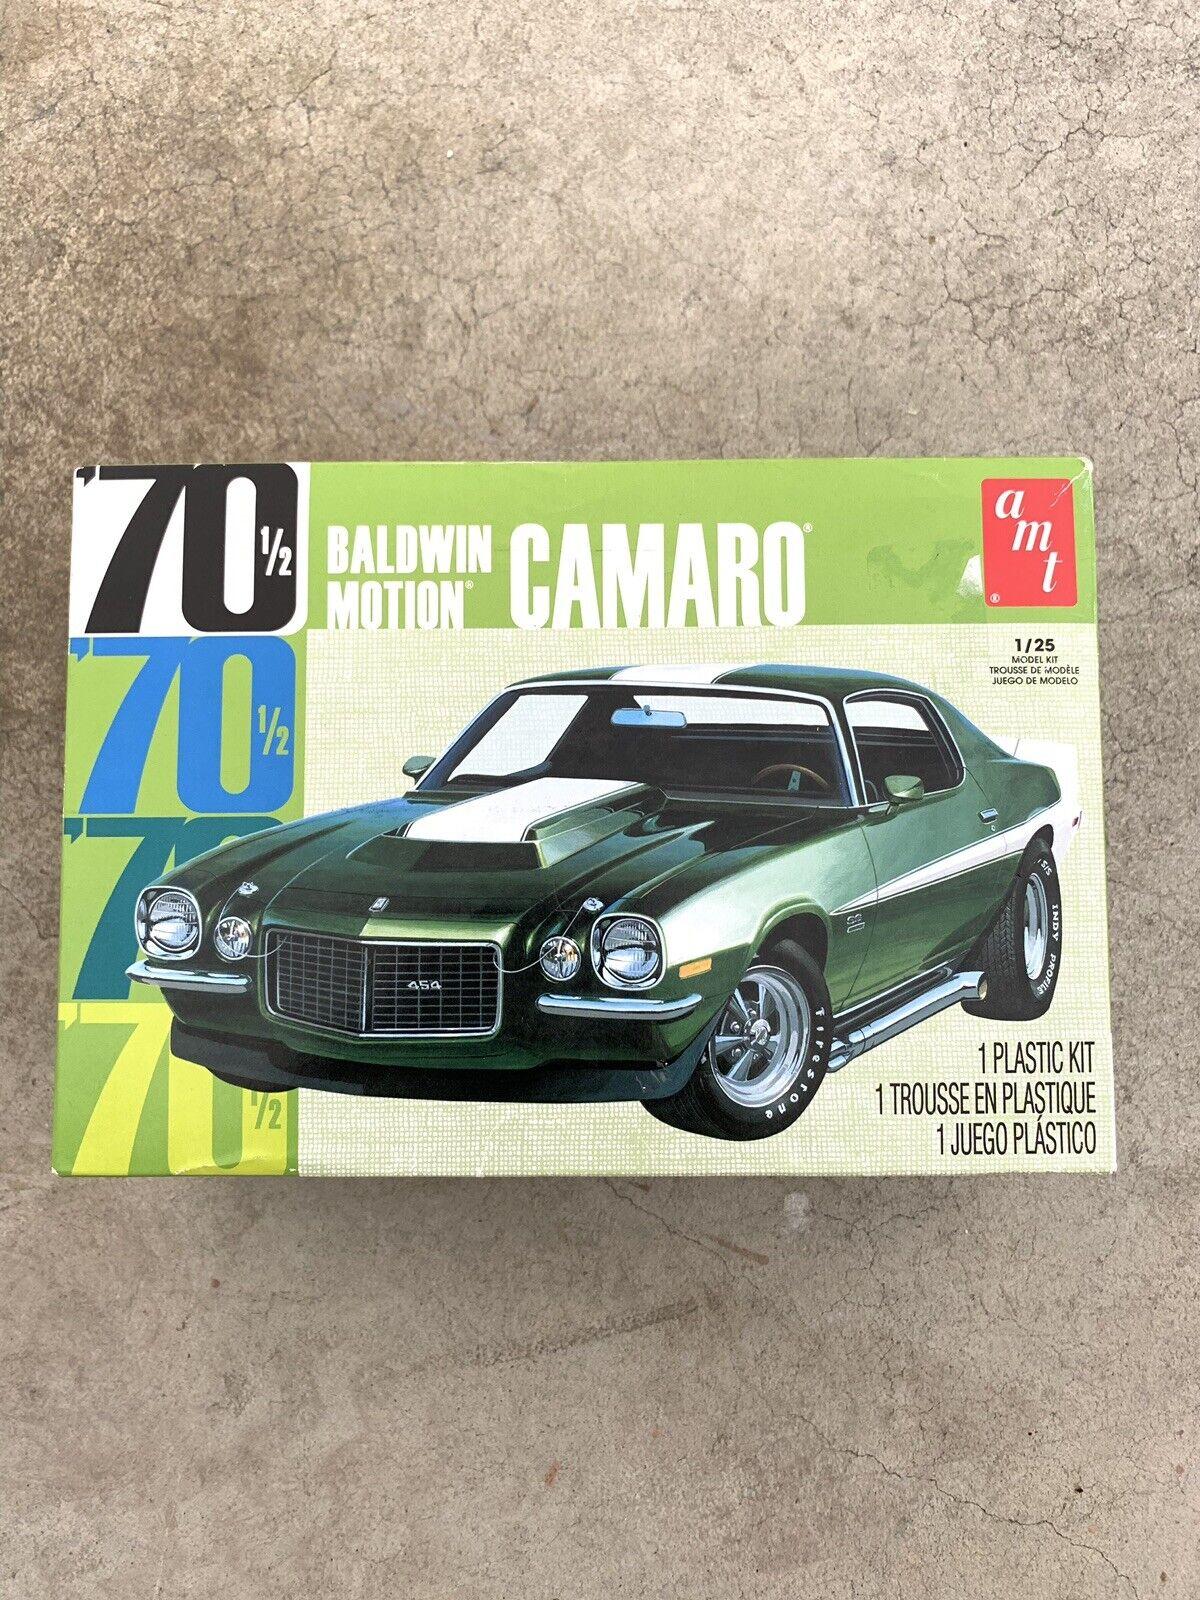 Vtg Camaro American Music Vehicle Model lego 's Art series 1990